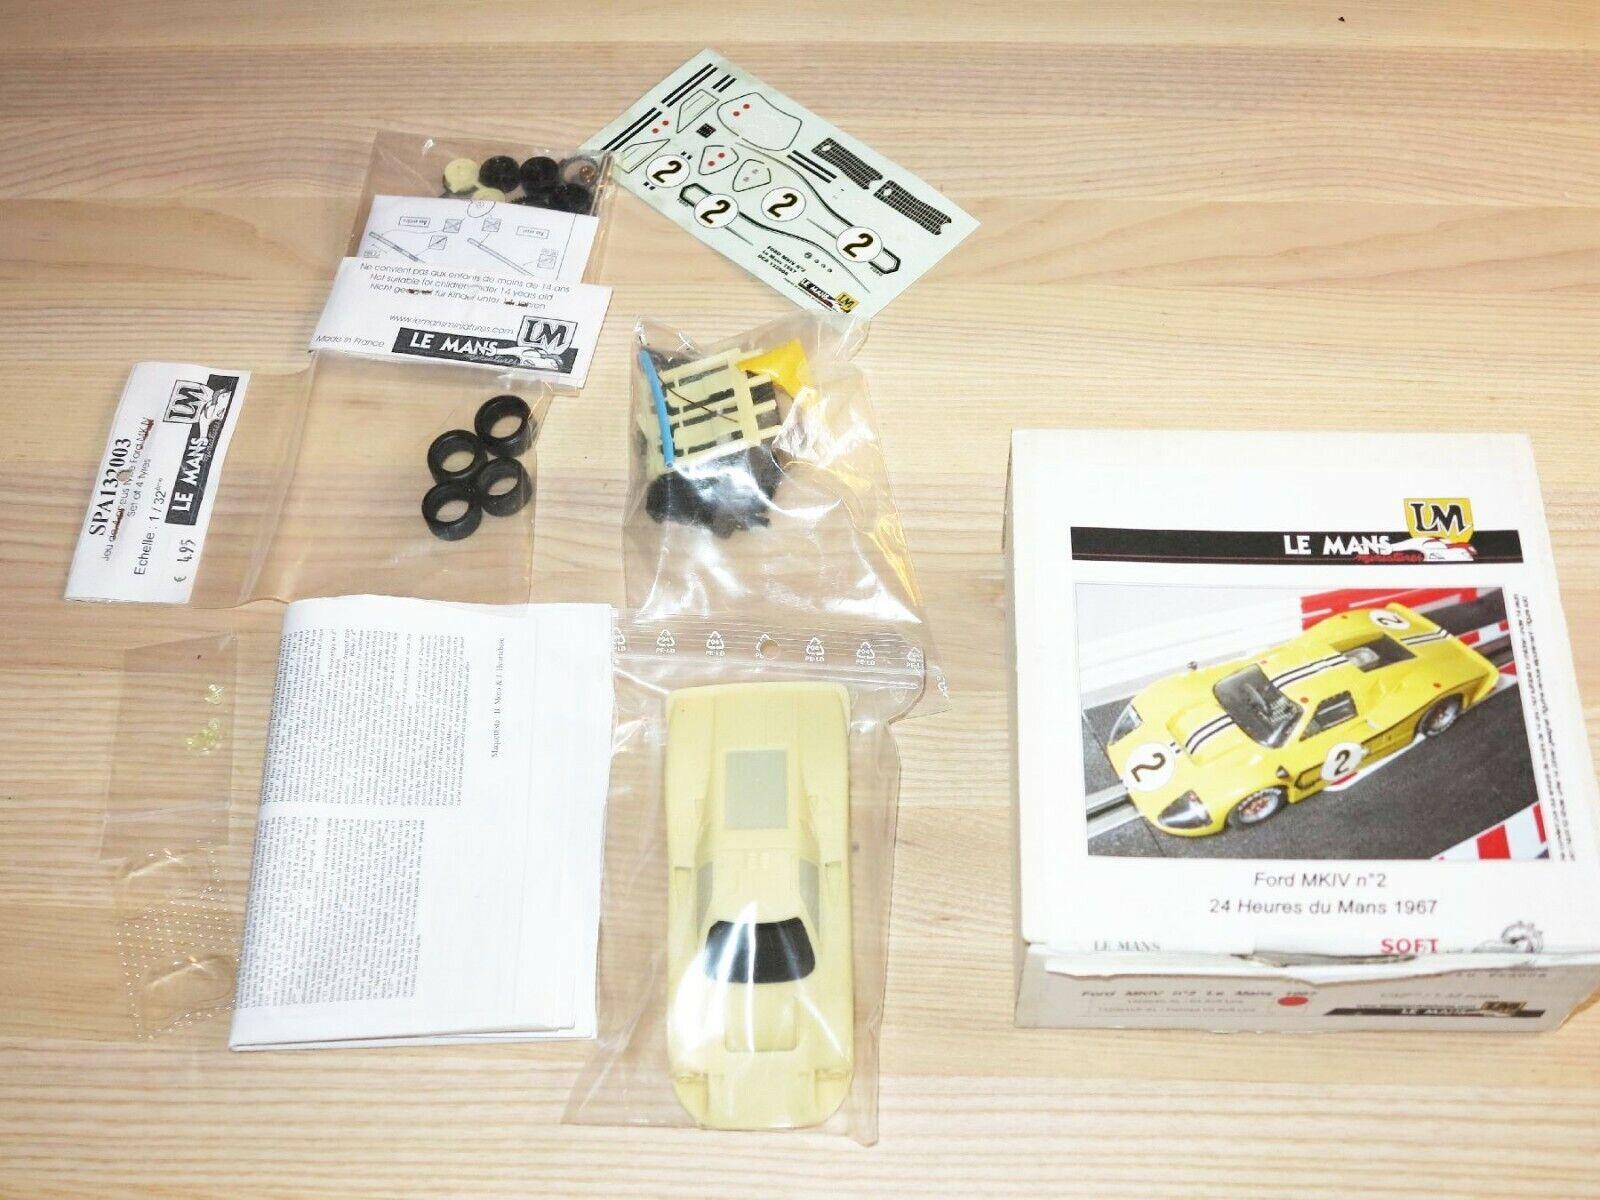 Ven a elegir tu propio estilo deportivo. Lm Le Le Le Mans Miniaturas Ford Mkiv 1967 1  3 2 Coche Slot  para barato